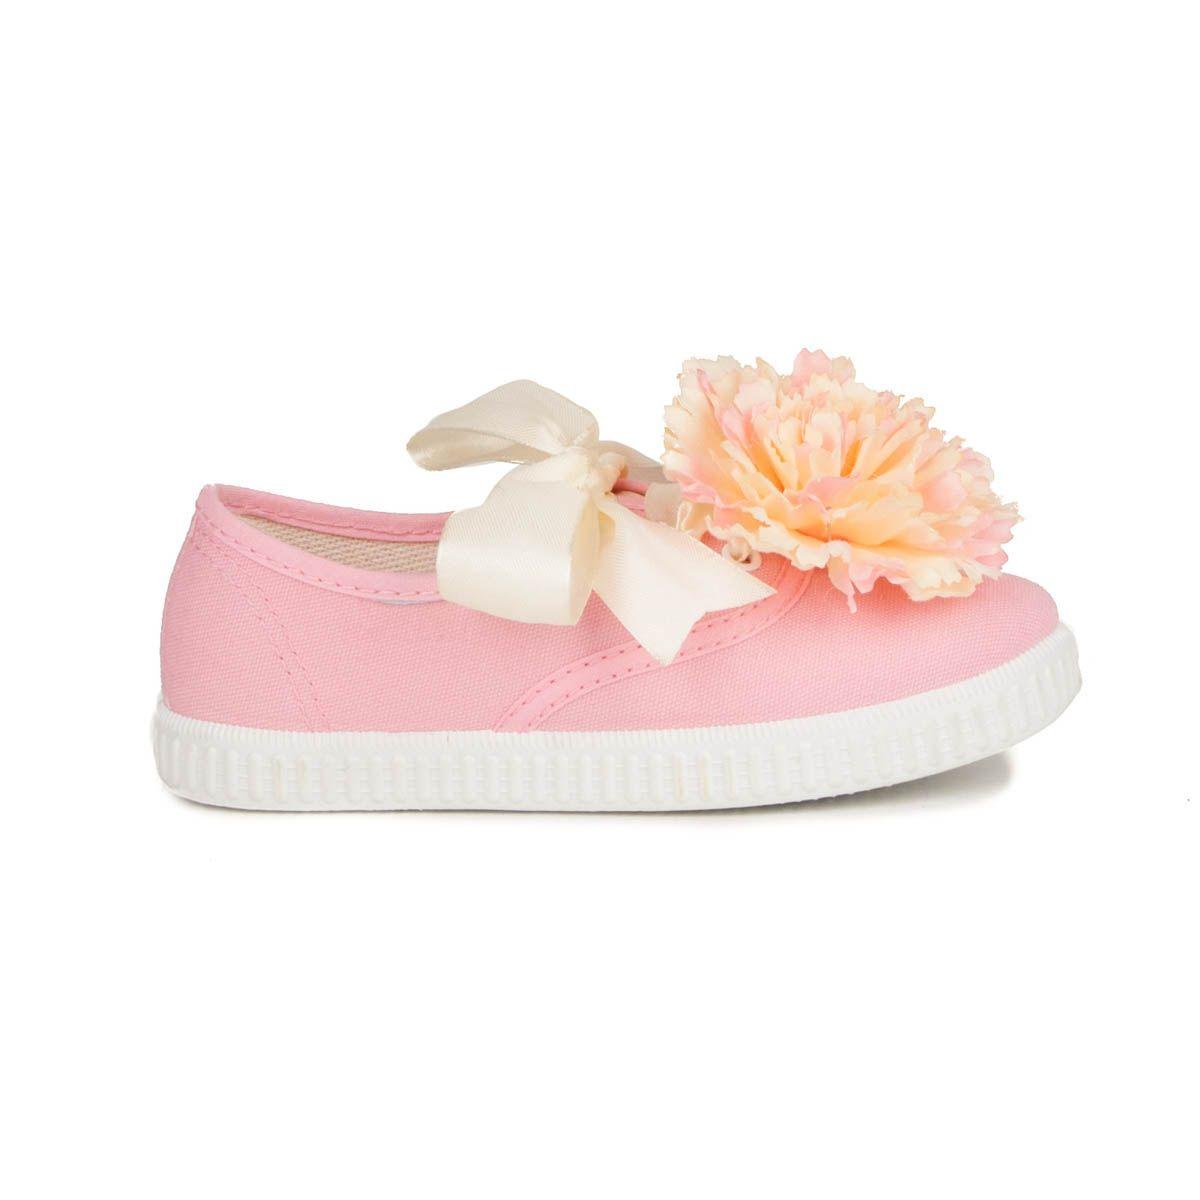 Maria Graor Ribbon Lace Sneaker in Pink